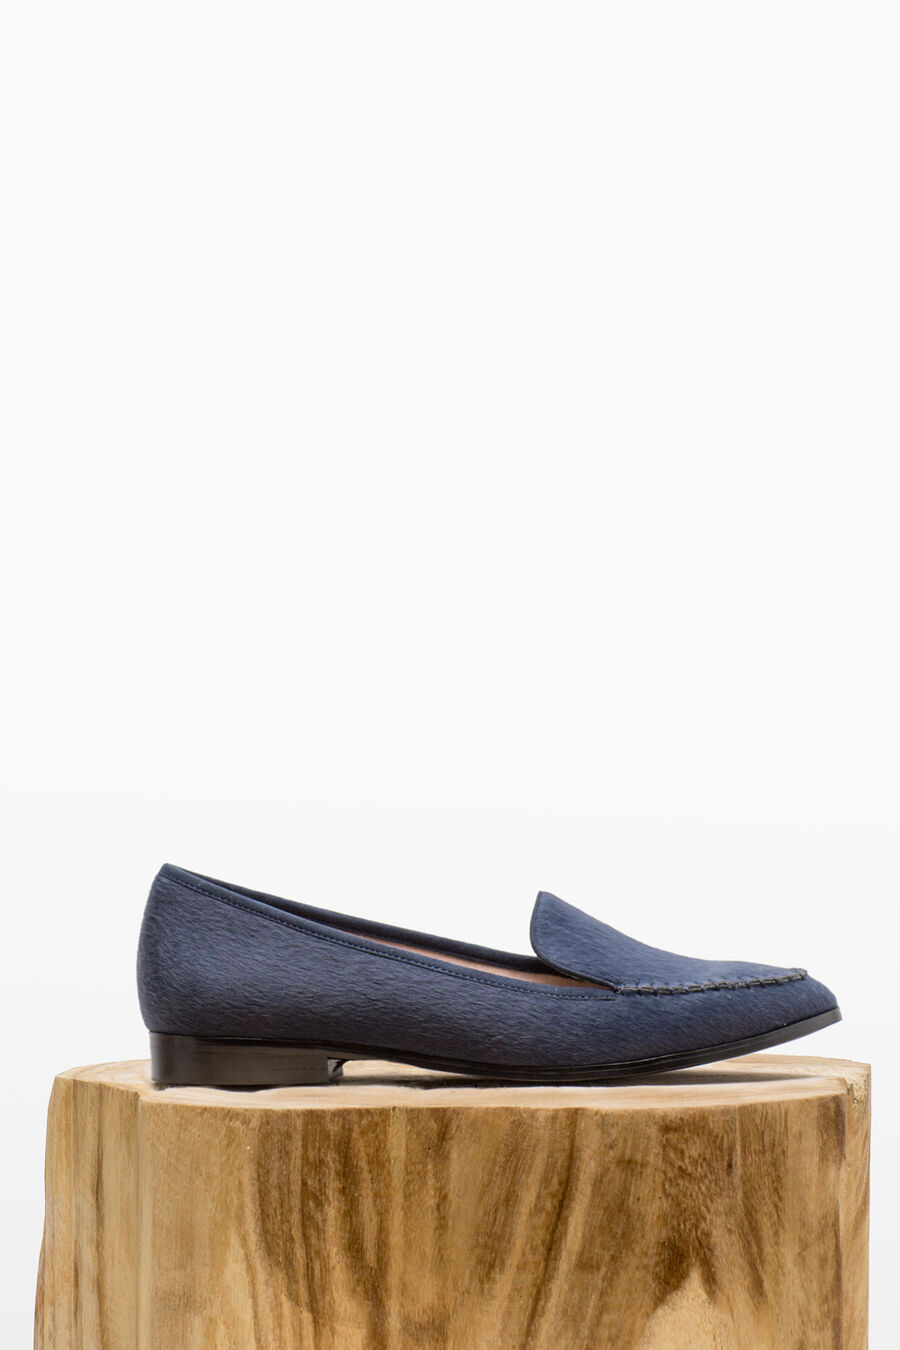 Split leather moccasin